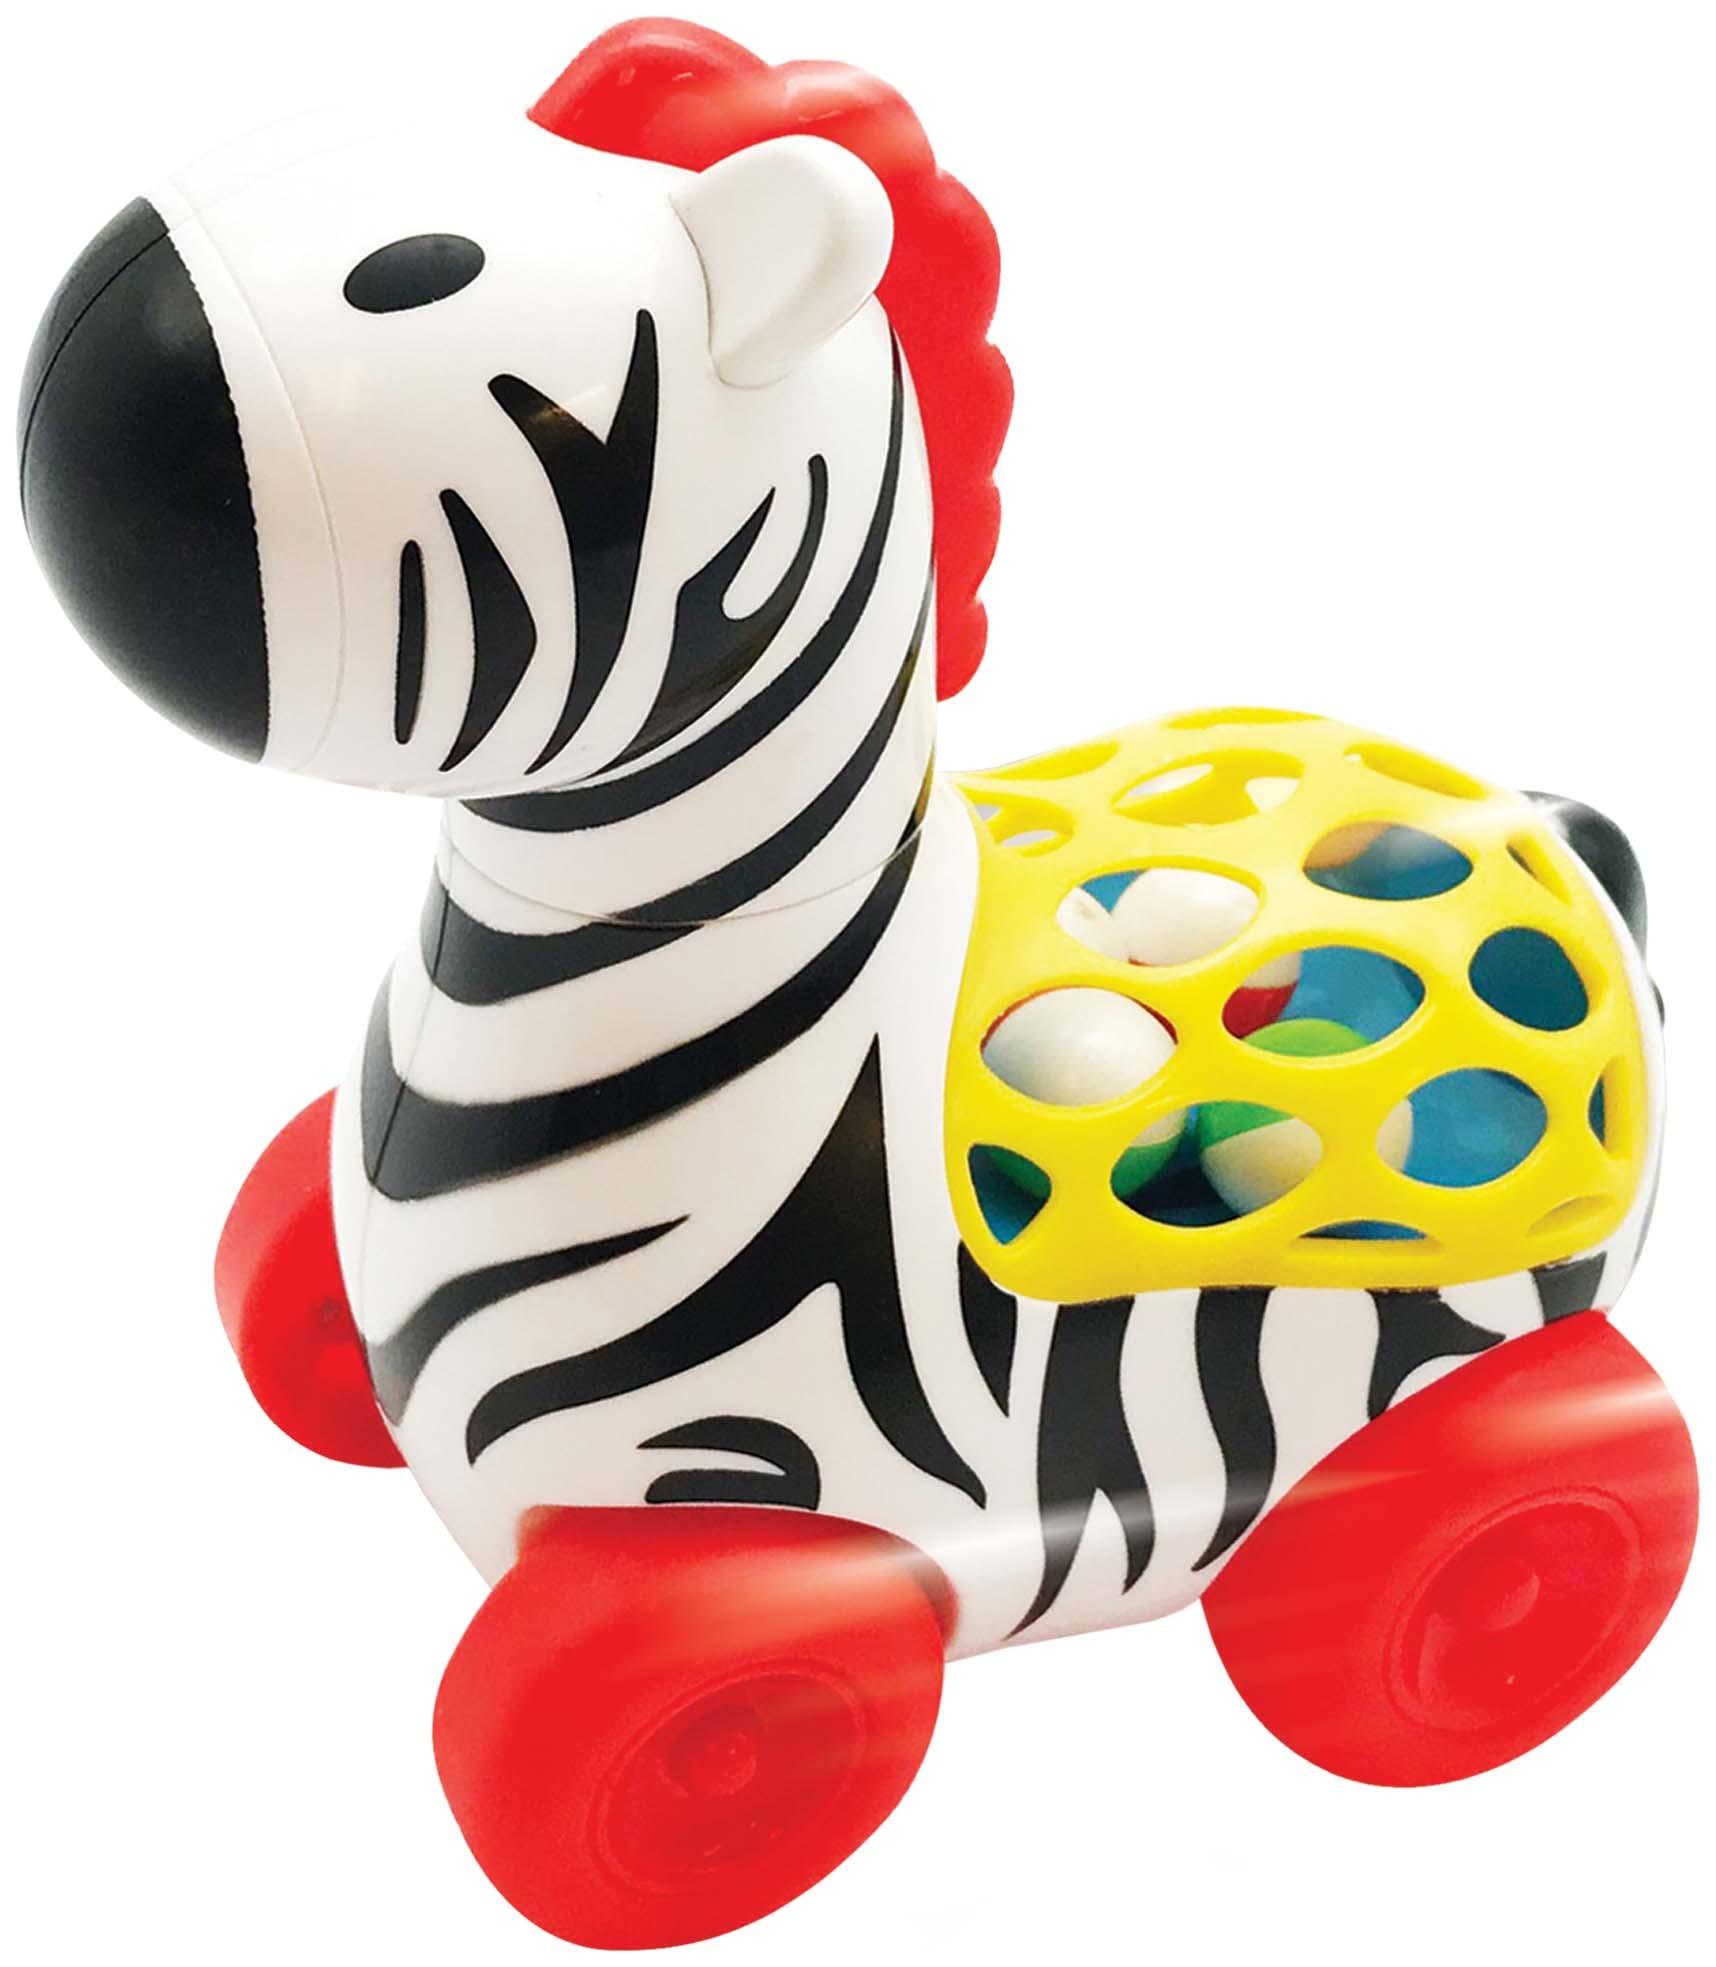 Развивающая игрушка Kiddieland Веселая Зебра KID 056812 фото